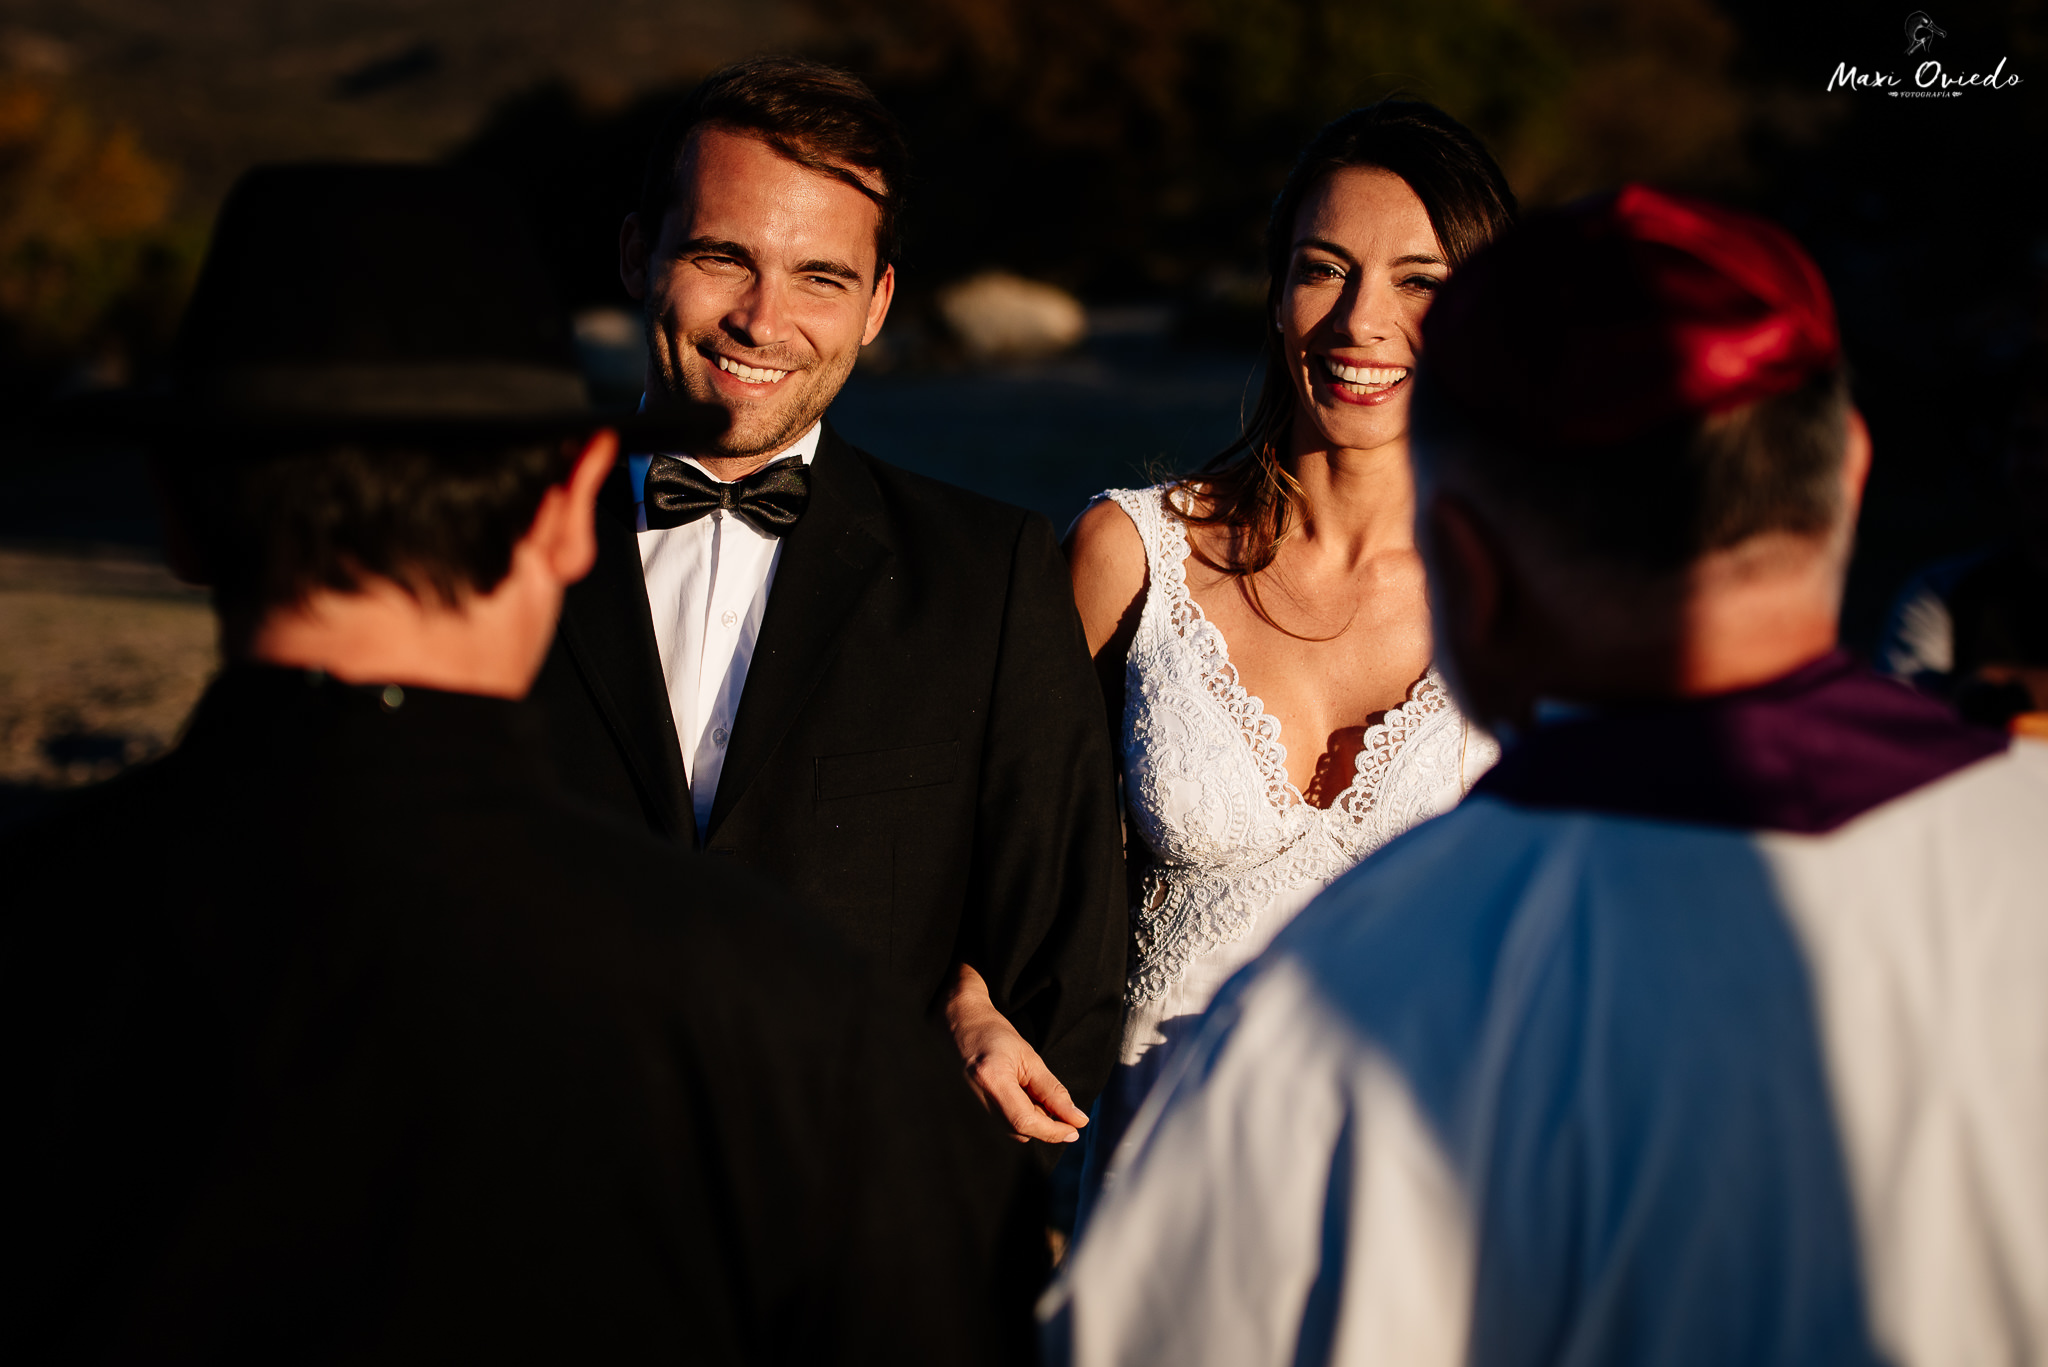 boda sextuple la cumbre cordoba cuchi corral fotografo de bodas fotografo de casamientos rosario san nicolas argentina vestido de novia ramo de novia-28.jpg